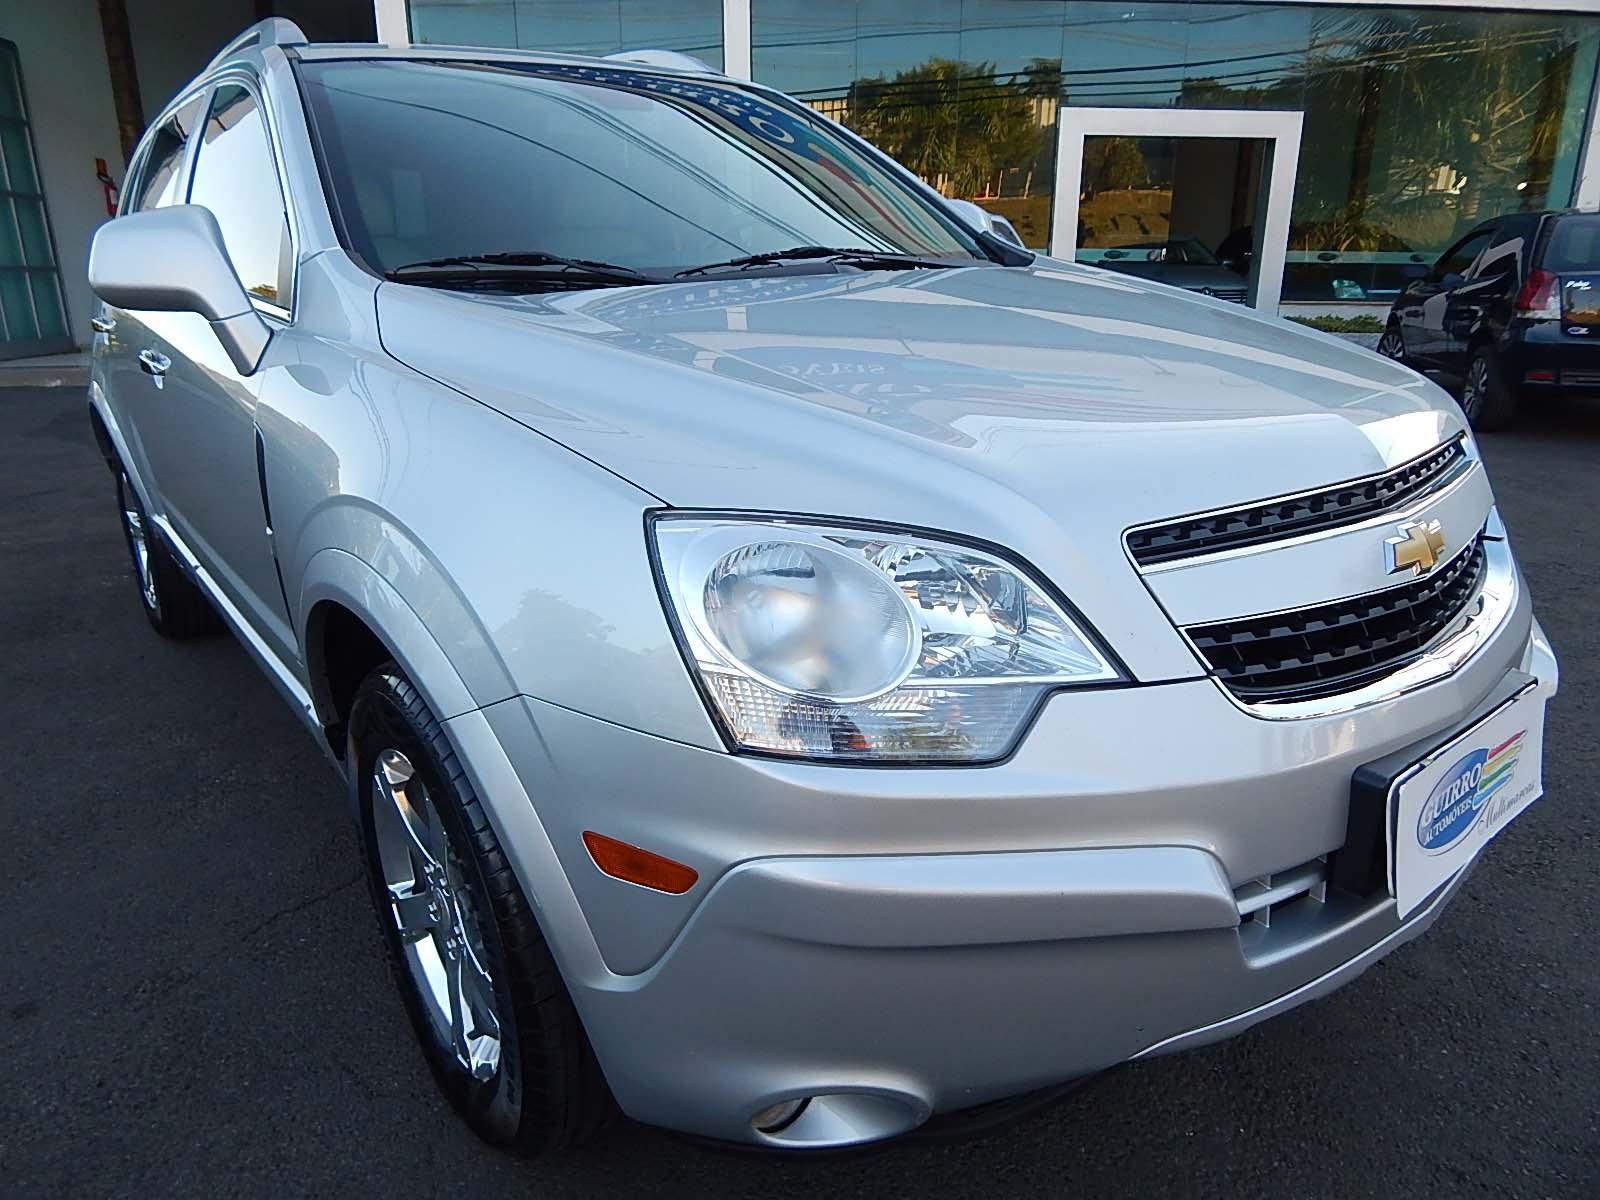 2008/2009 - Gasolina